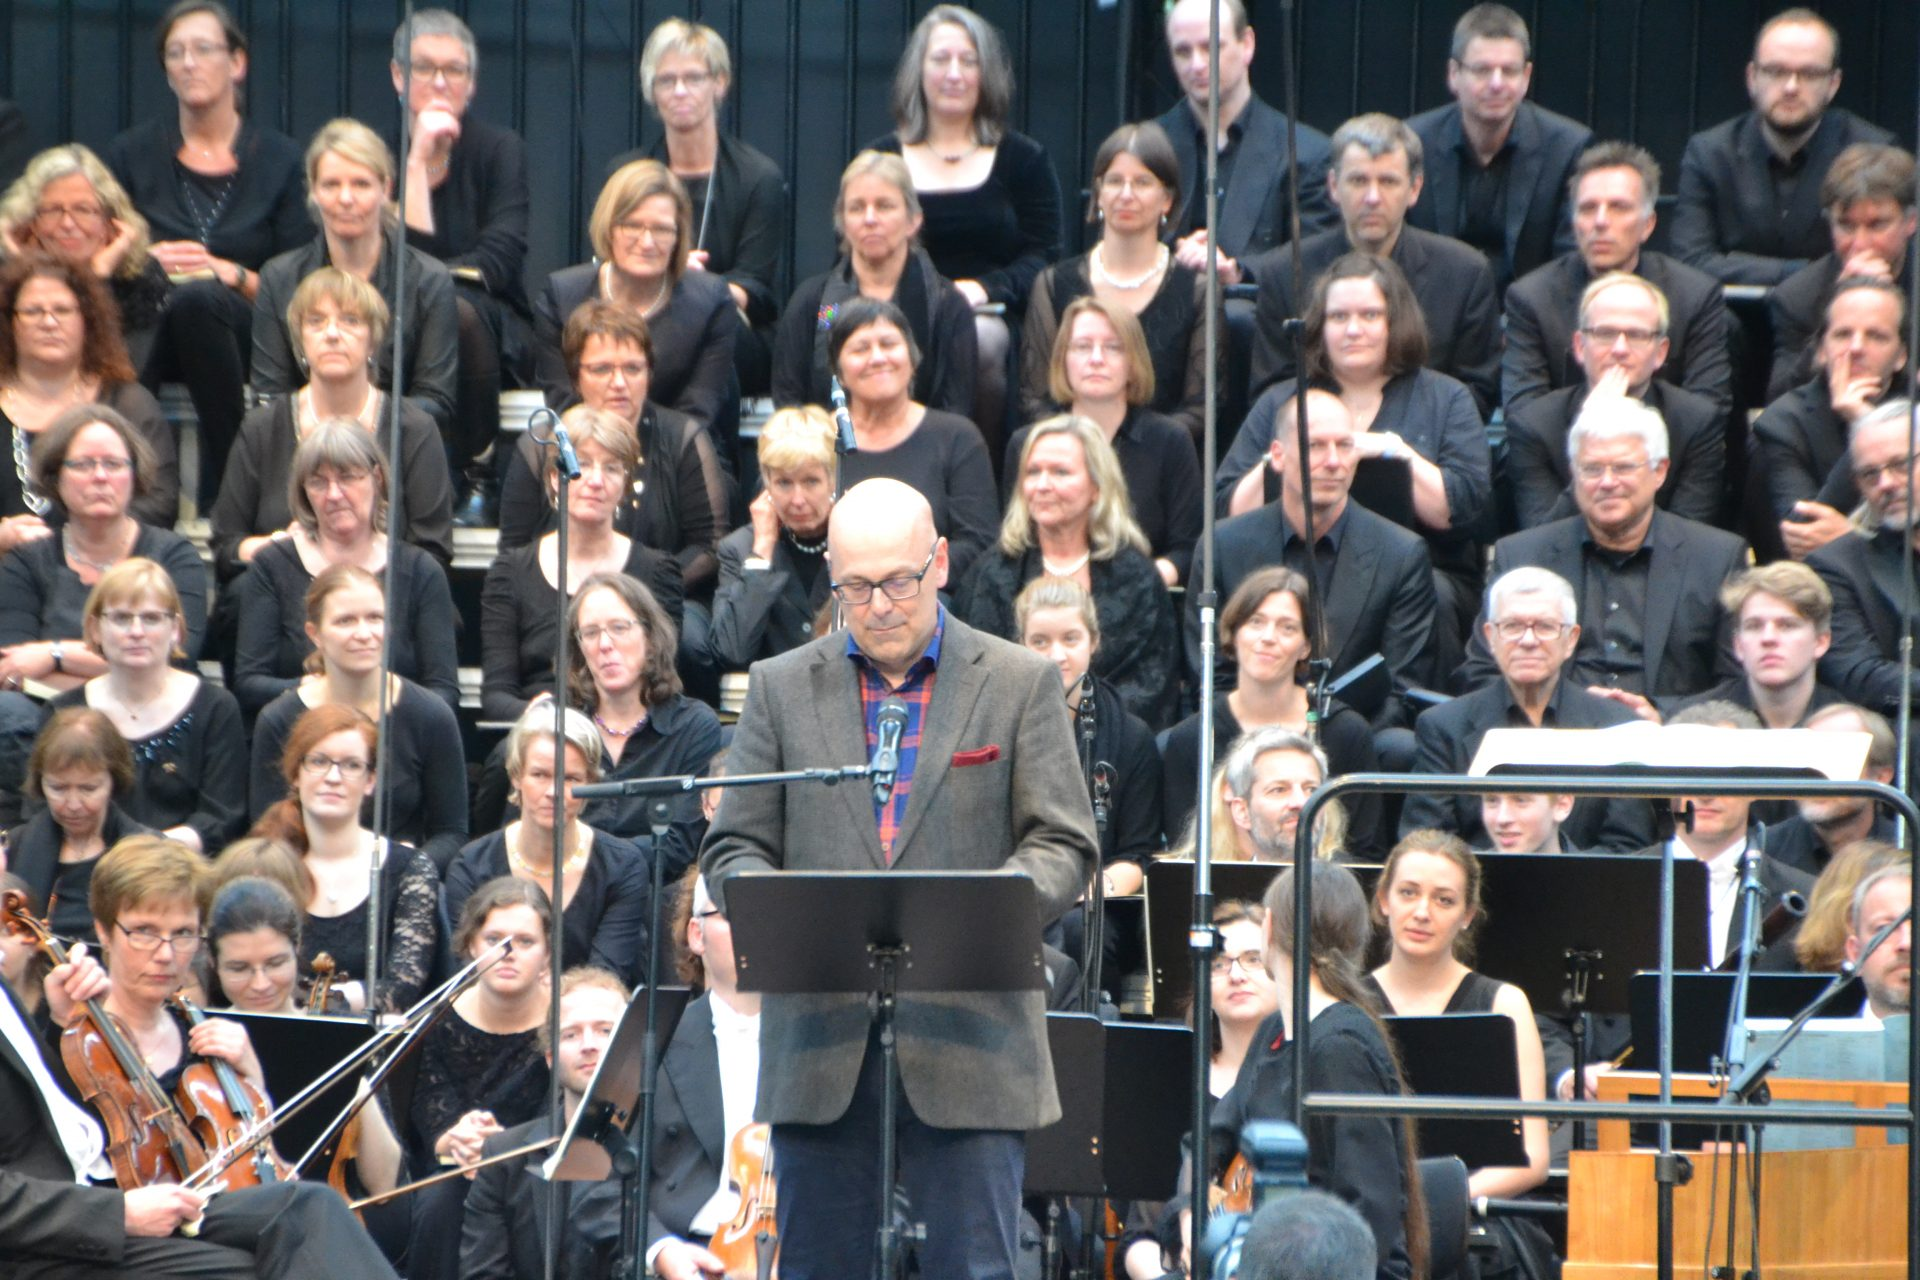 Festkonzert 30 Jahre SHMF – The Big Seasons